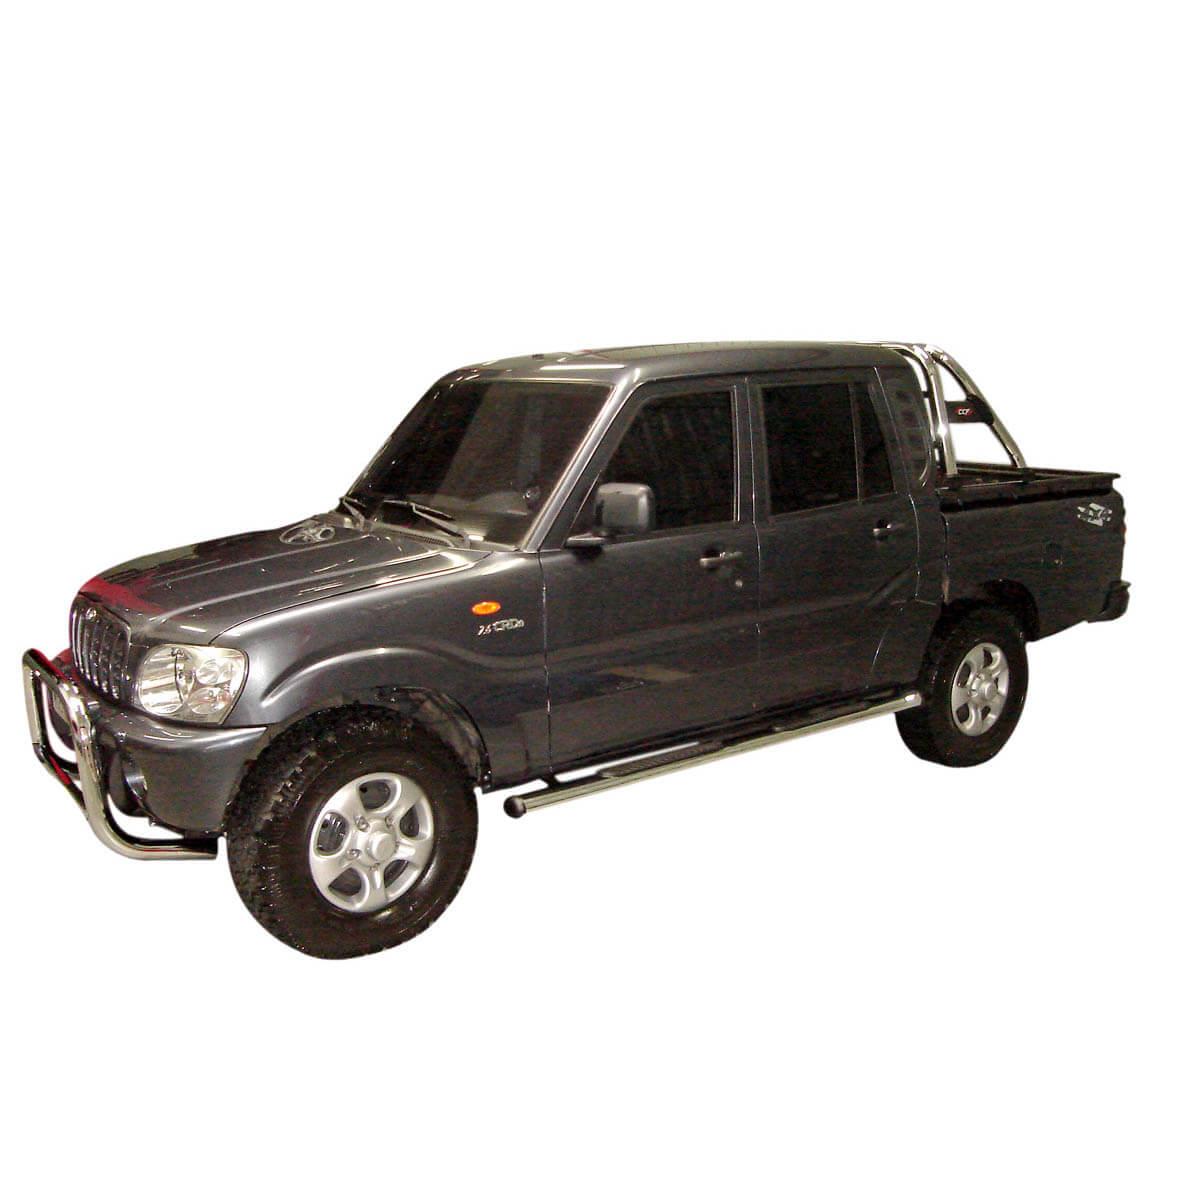 Santo antônio duplo Mahindra pick up 2008 a 2014